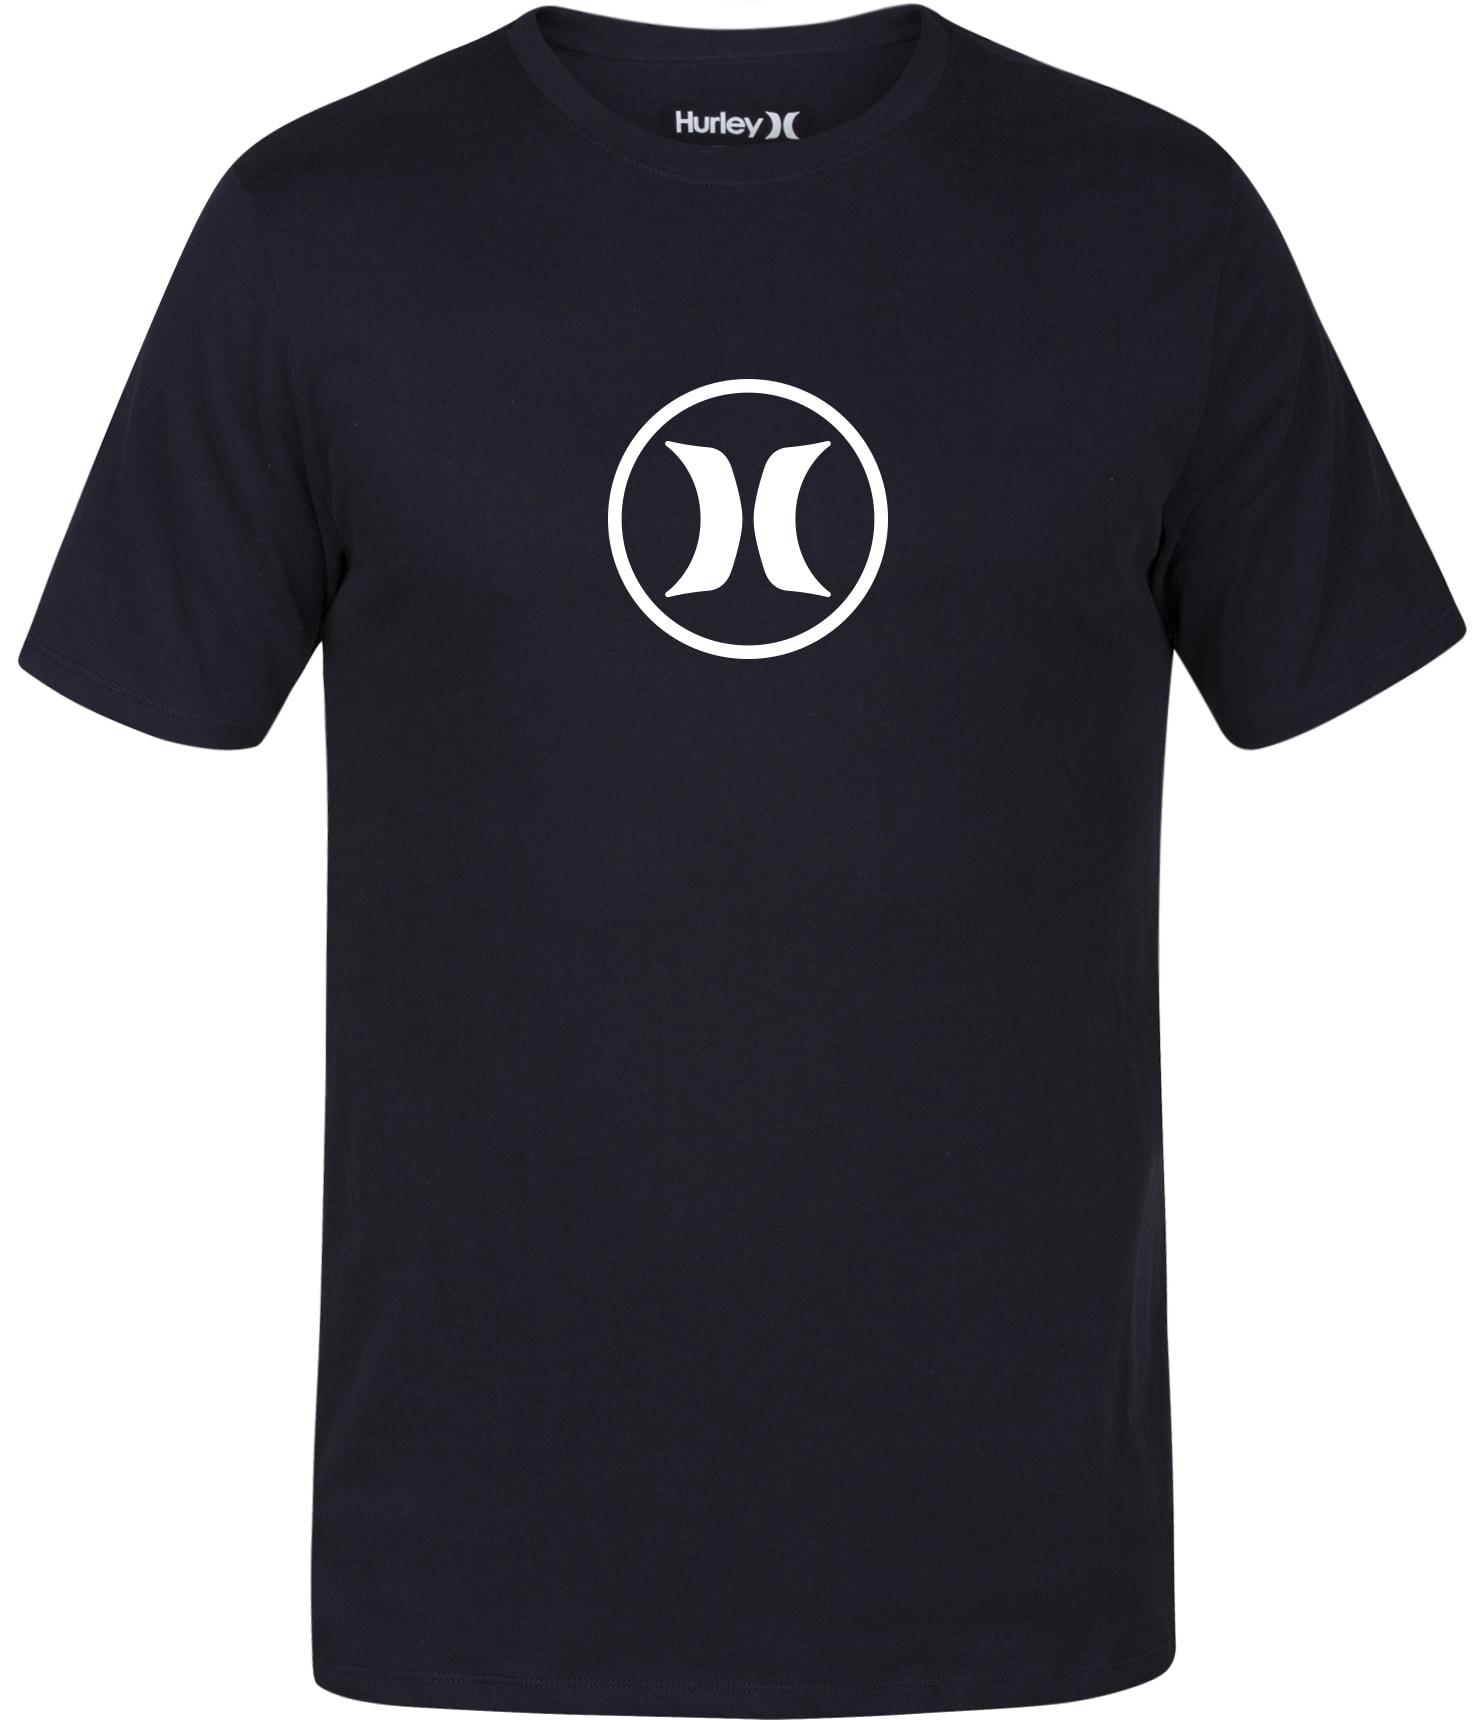 Hurley Circle Icon Dri-Fit T-Shirt hr3cidf06bk17zz-hurley-t-shirts